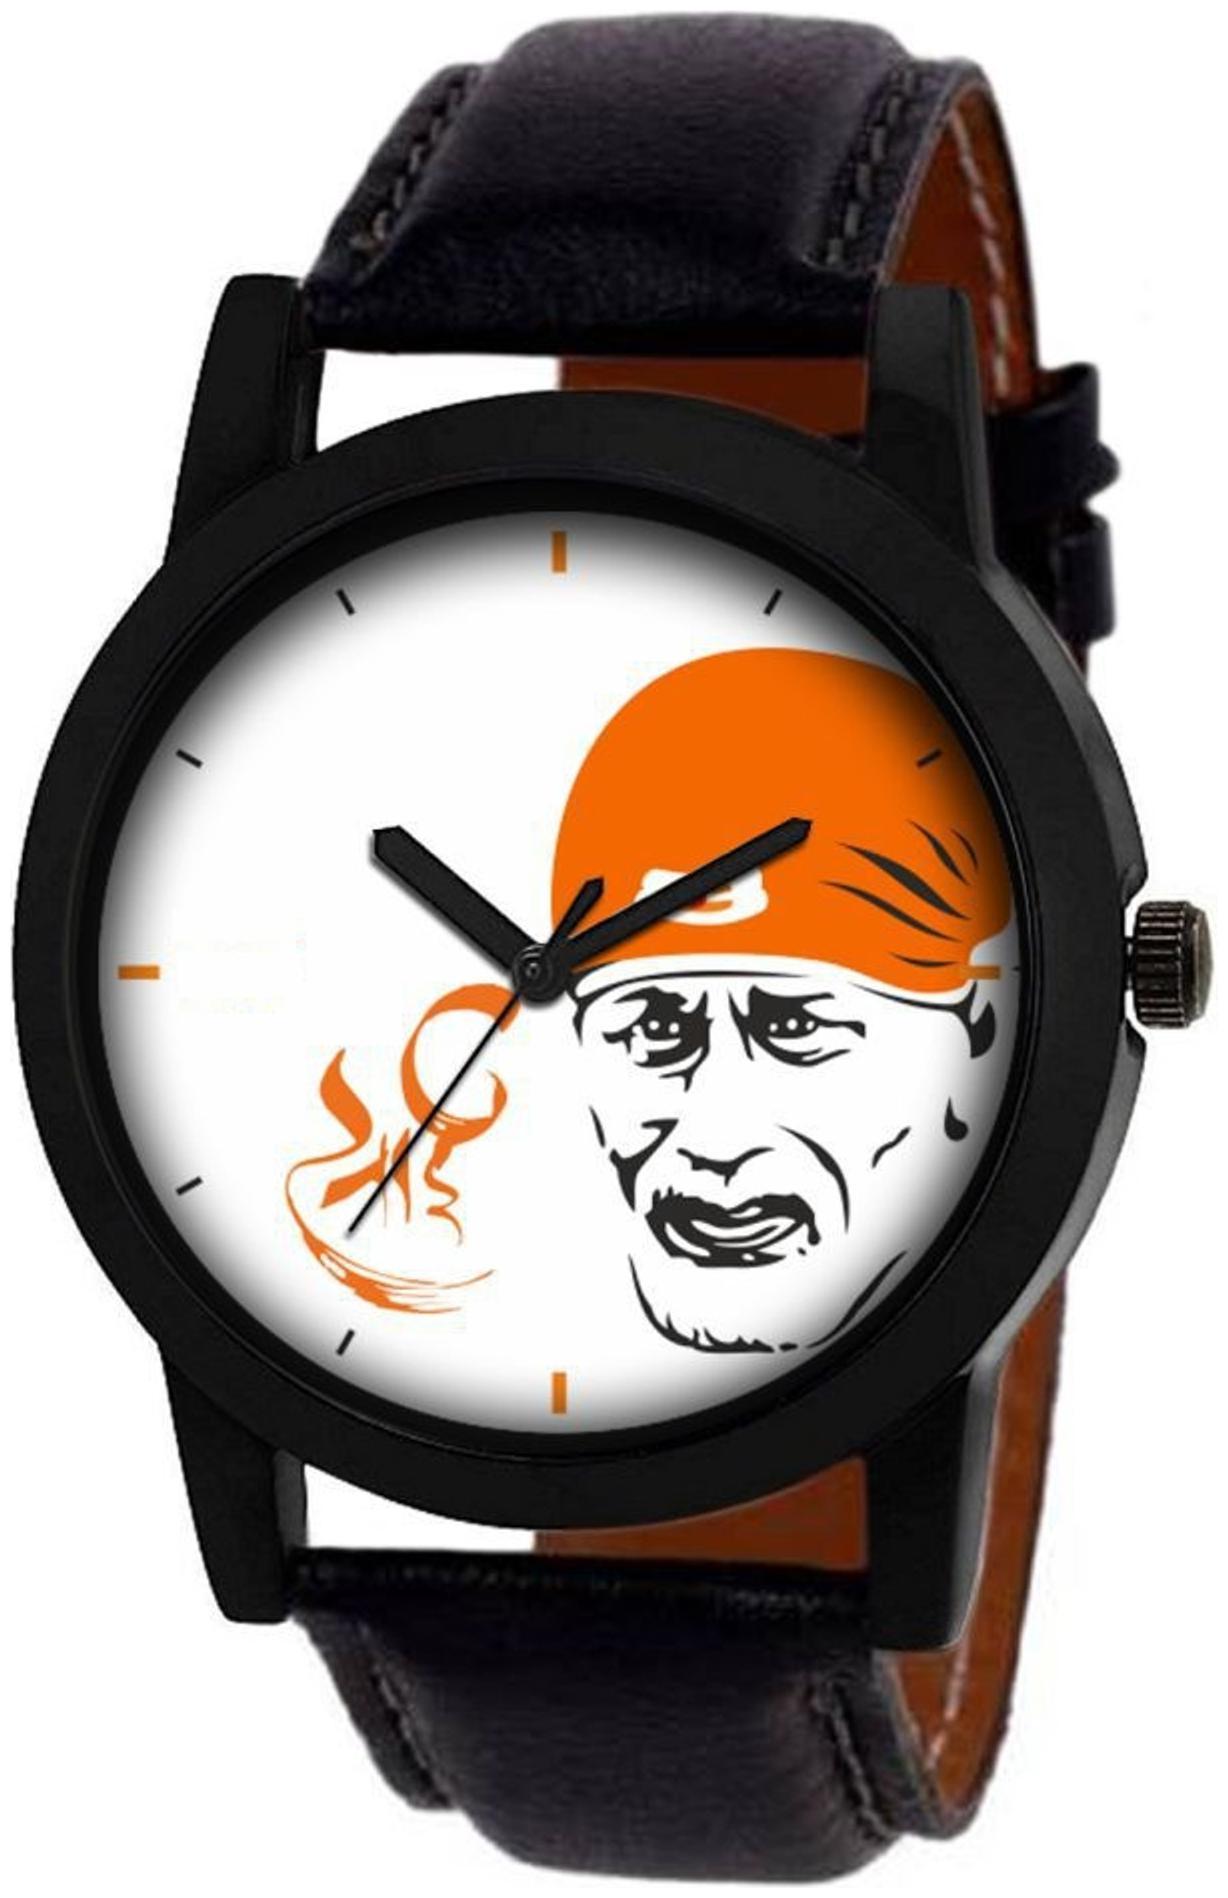 AK Analog Watches For Men